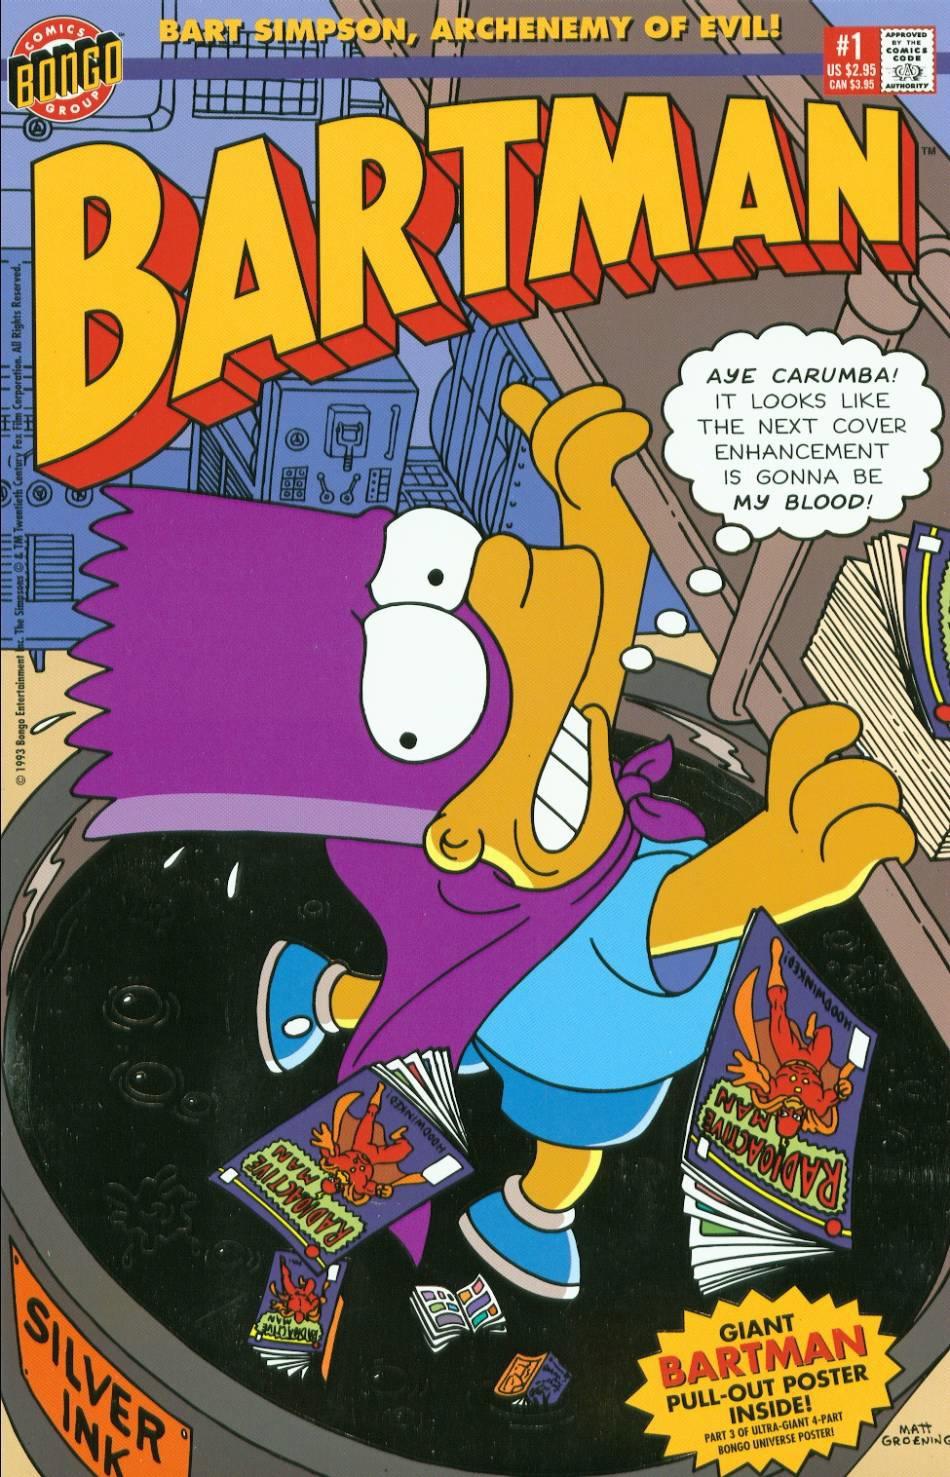 Bartman (Comic Book Series)